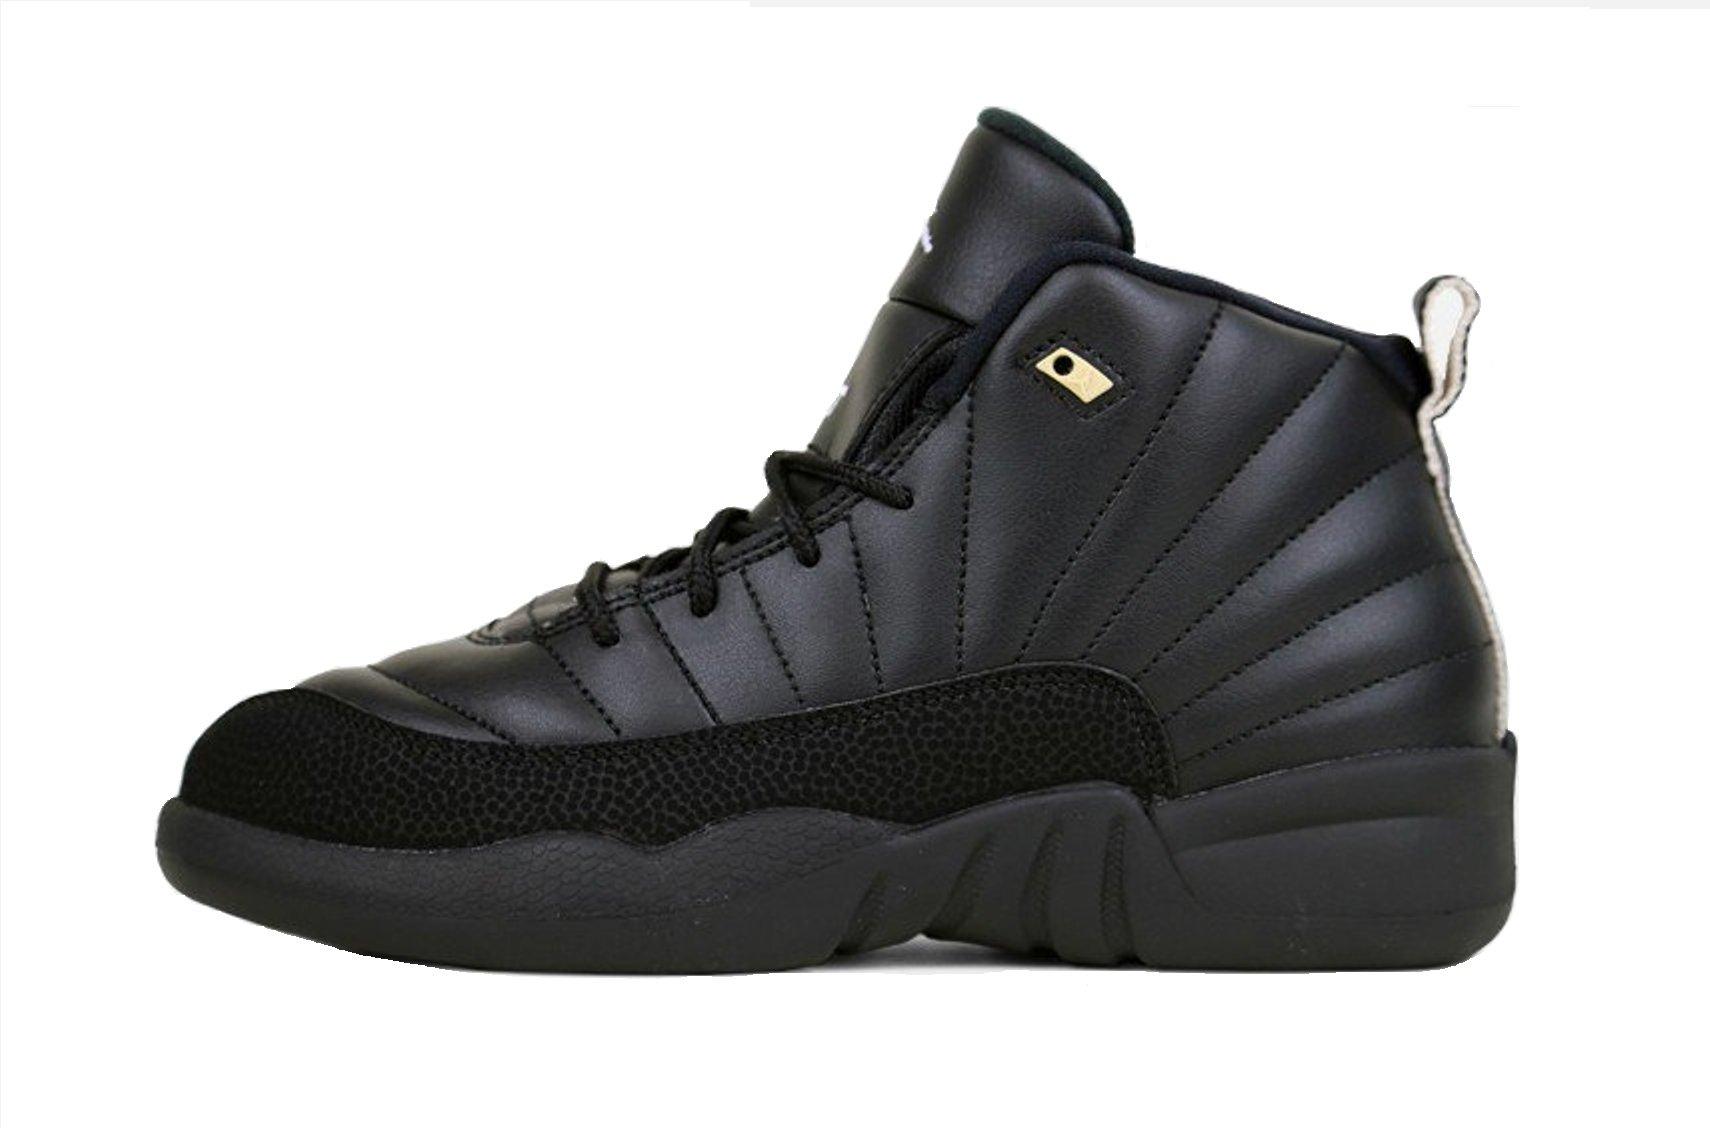 Nike Air Jordan Retro 12 THE MASTER Preschool P.S Black Rattan White Metallic Gold 151186-013 (11) by NIKE